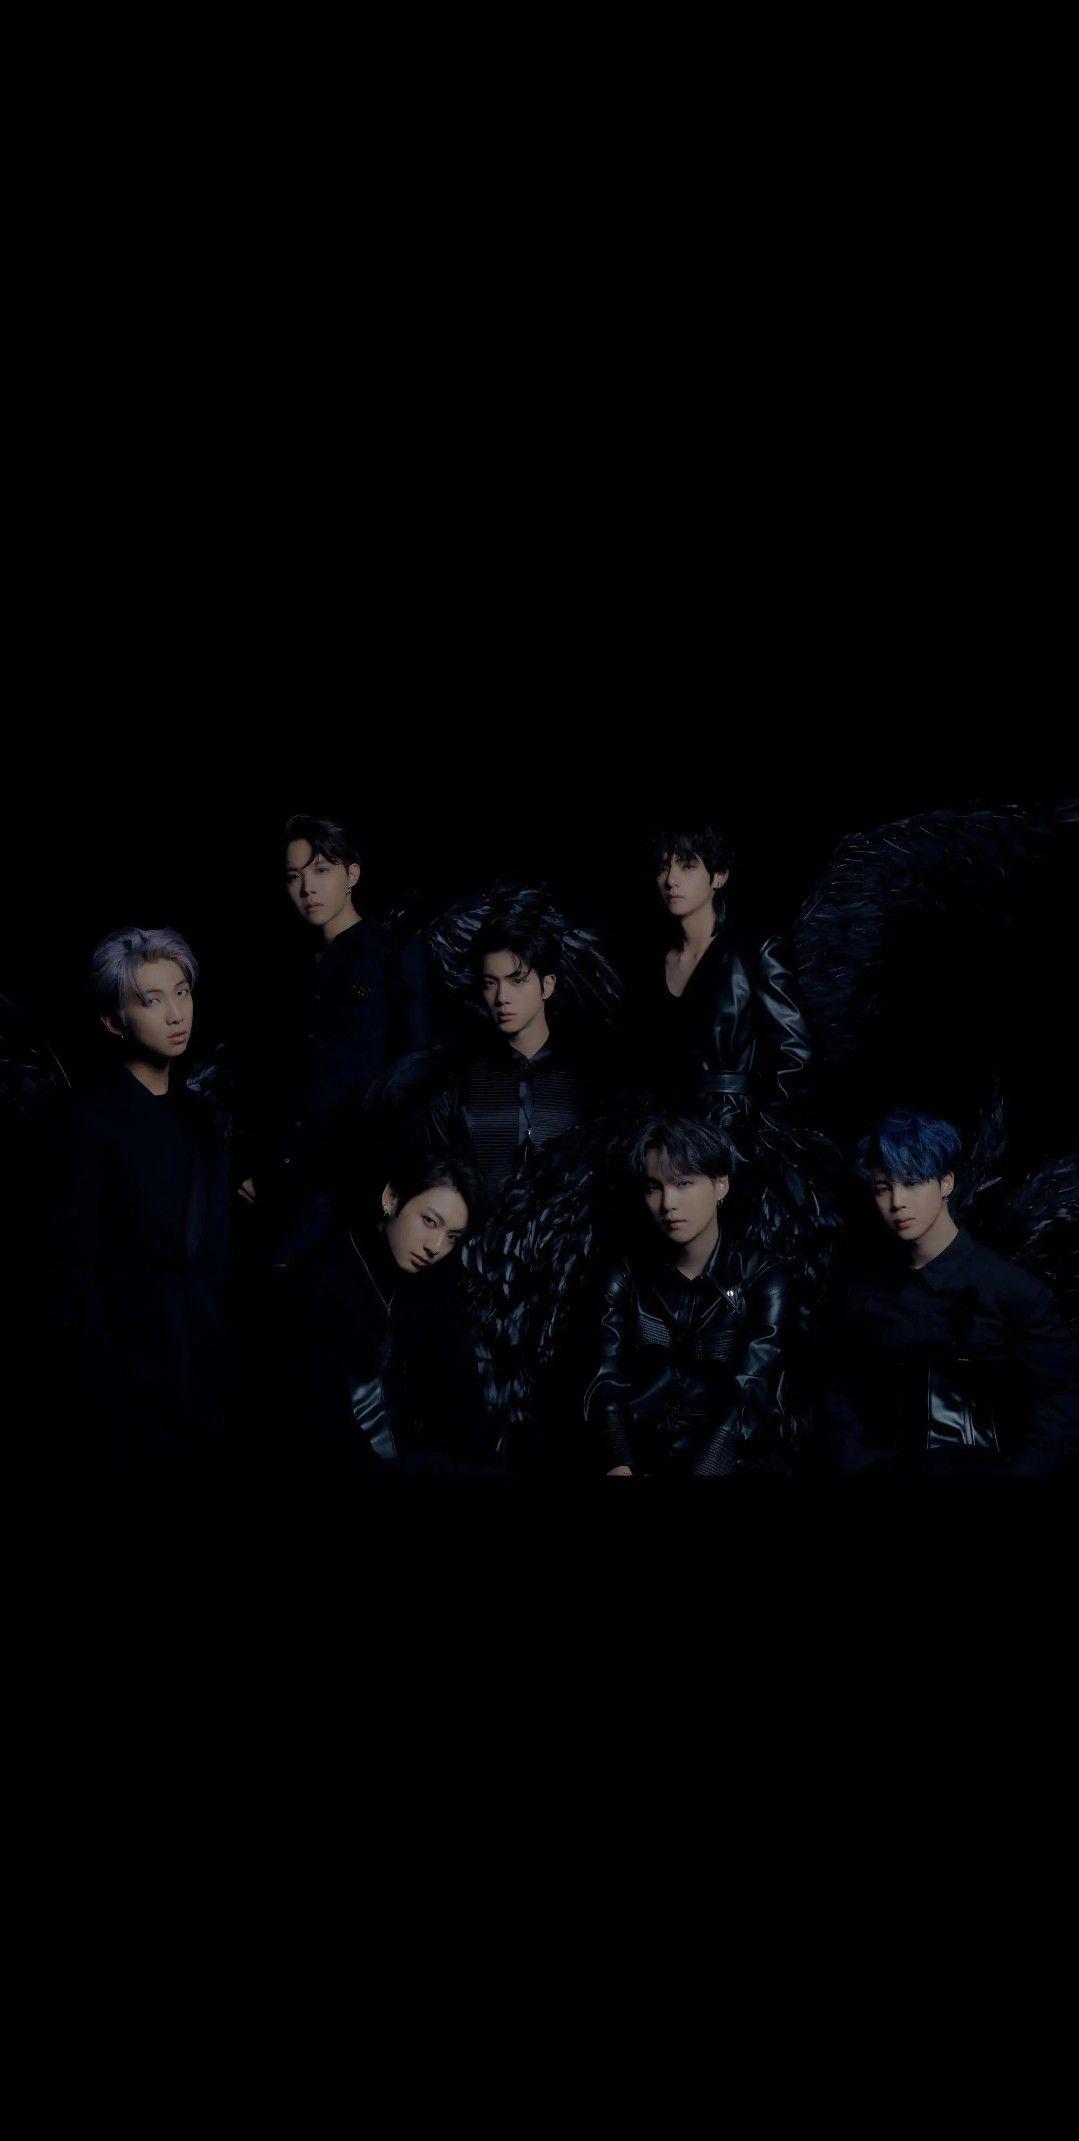 Black Swan Gambar Gambar Bts Lukisan Disney Bts black swan wallpaper download